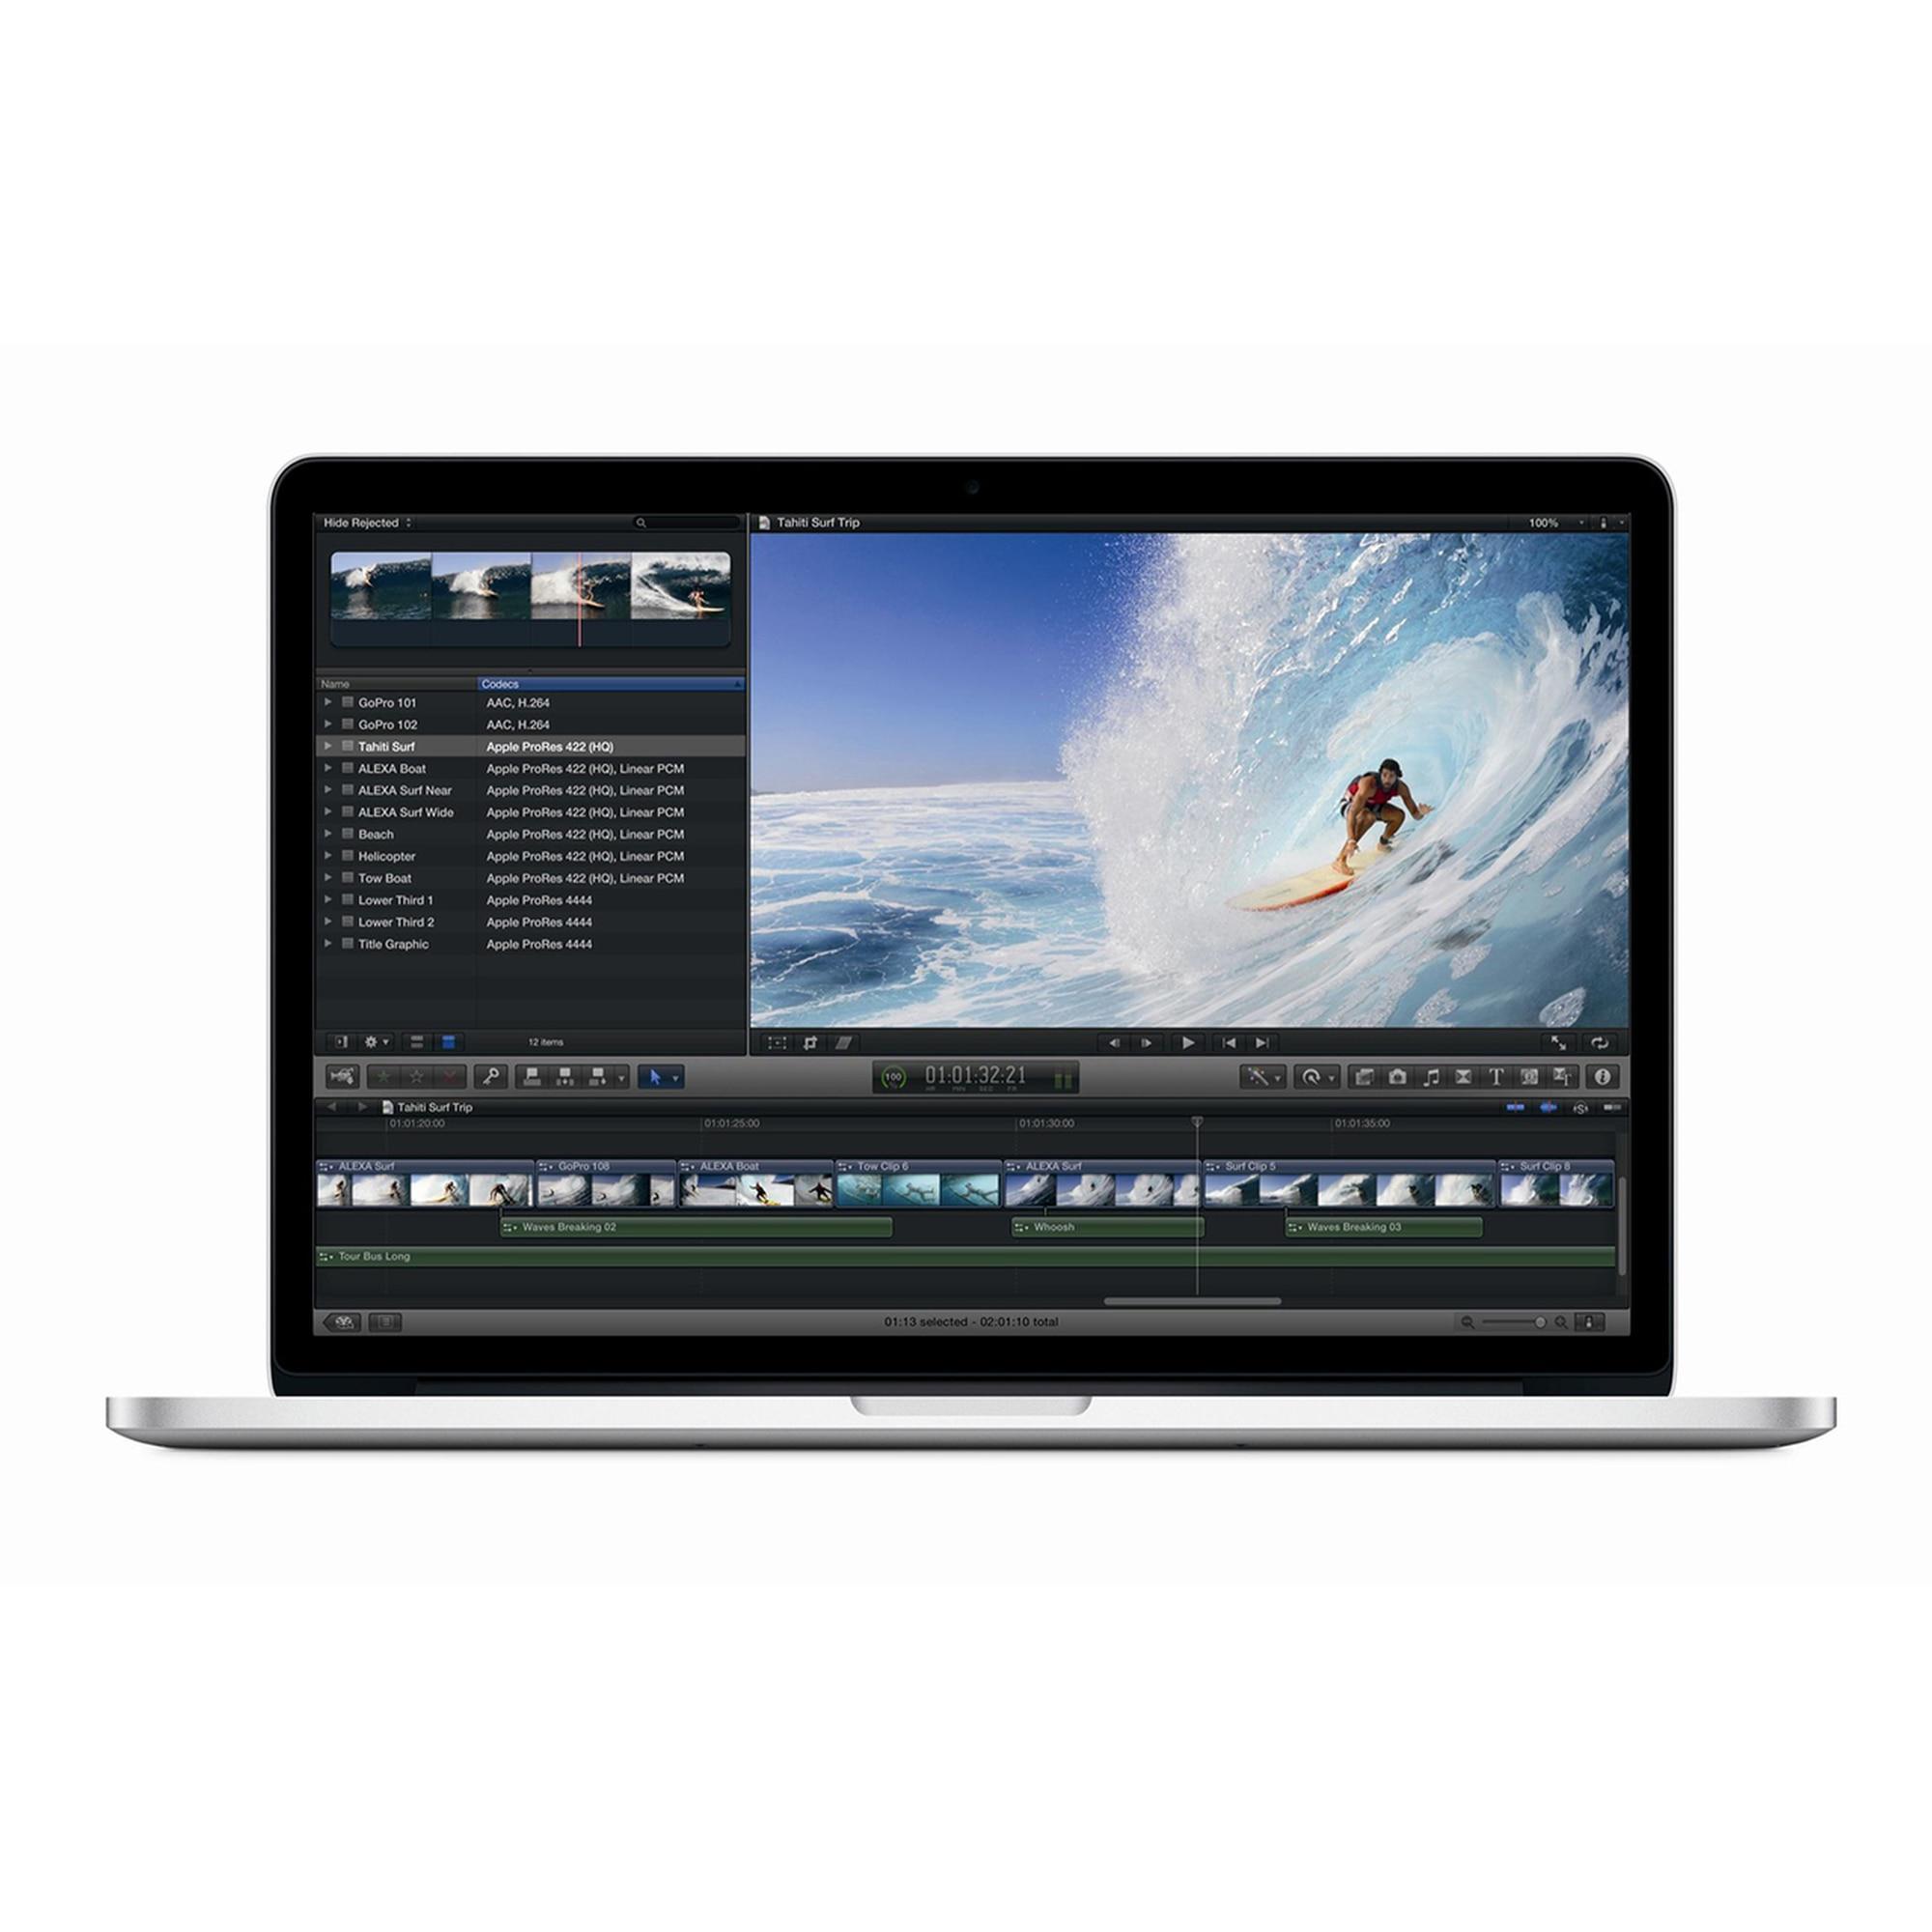 MacBook Pro Retina 15,4-tum (2014) - Core i7 - 16GB - SSD 128 GB AZERTY - Fransk